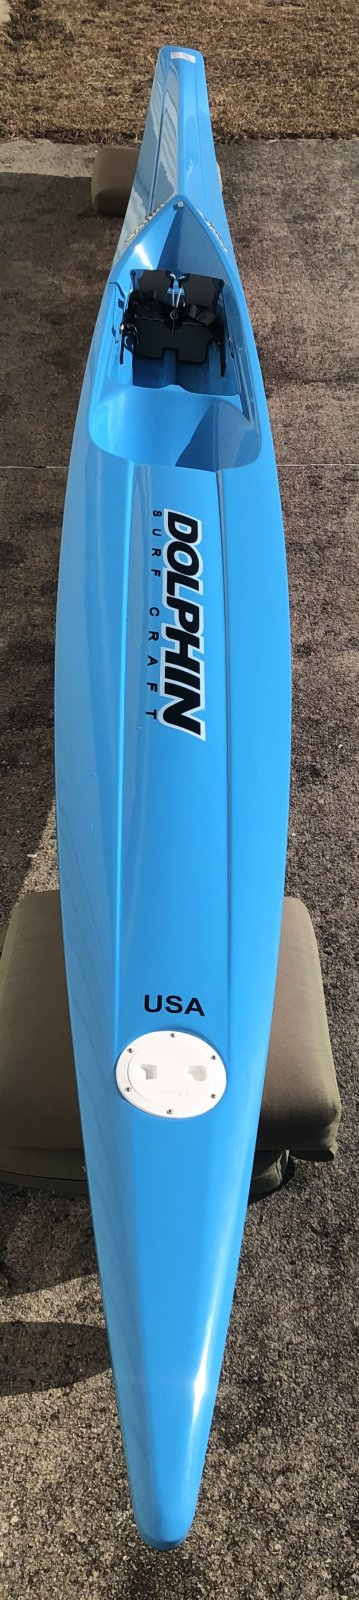 Dolphin Adjustable Drive II Surf Ski 19' - Demo 1040